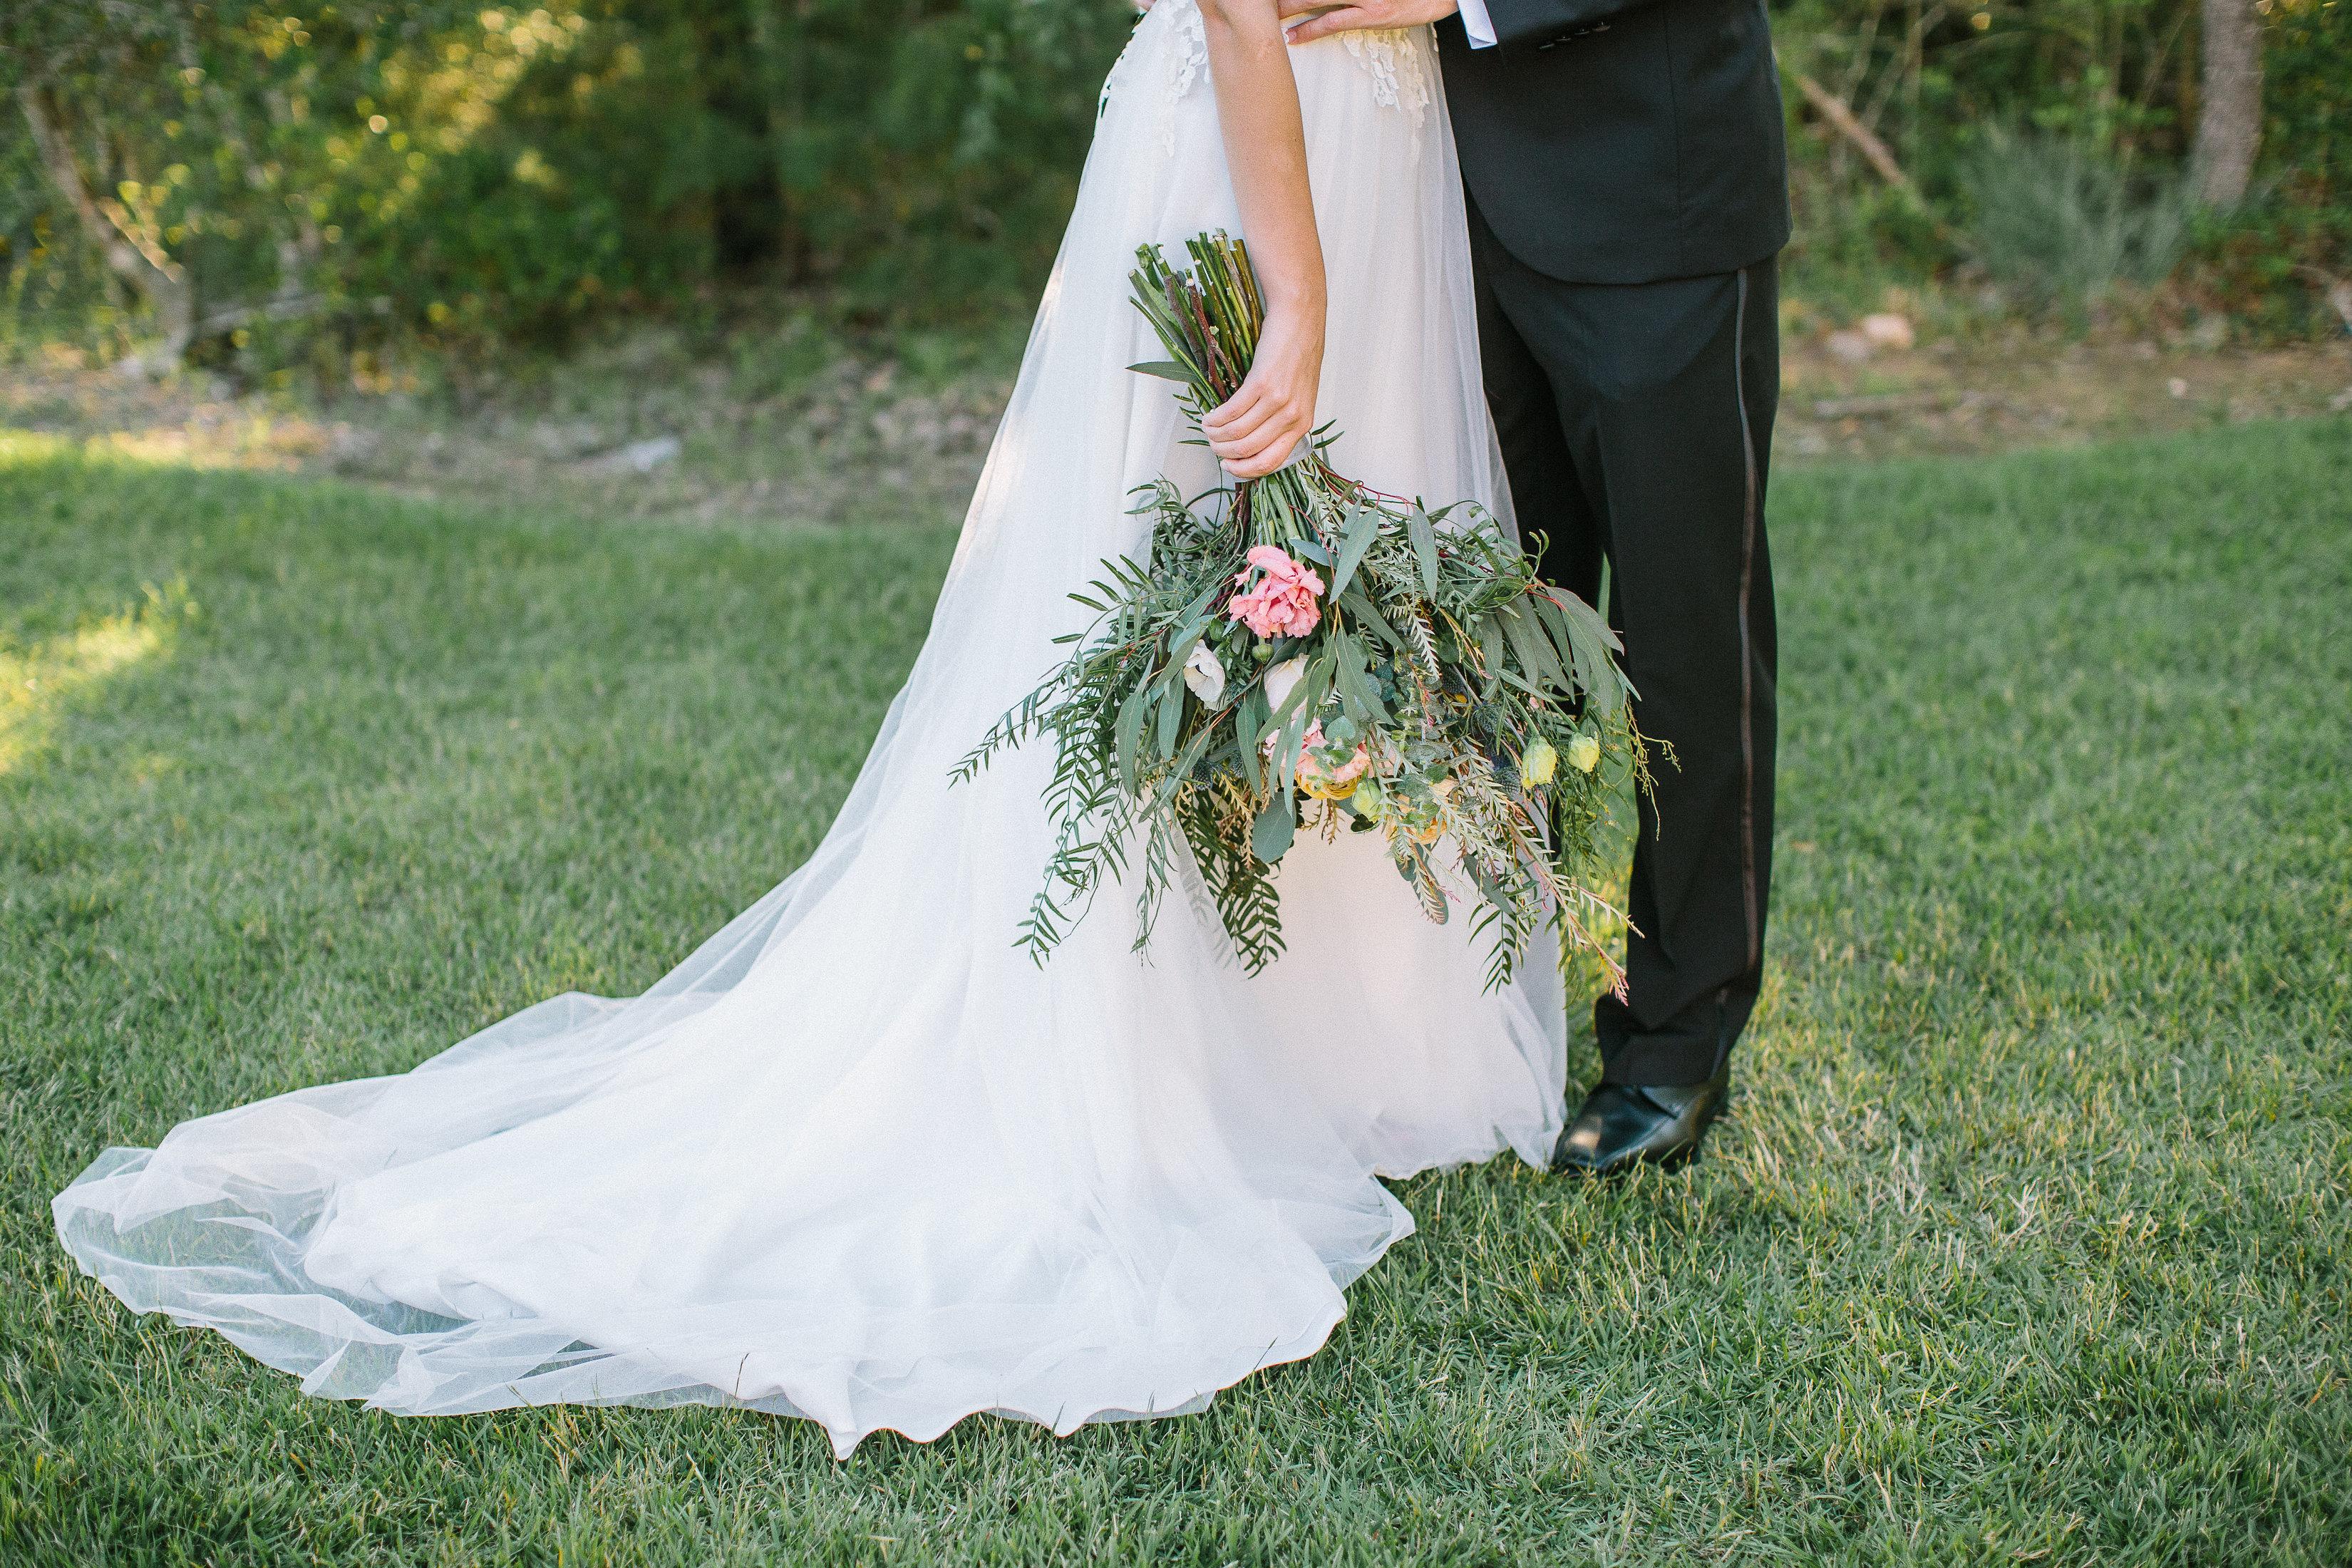 Ellen-Ashton-Photography-Peach-Creek-Ranch-Weddings-Wed-and-Prosper211